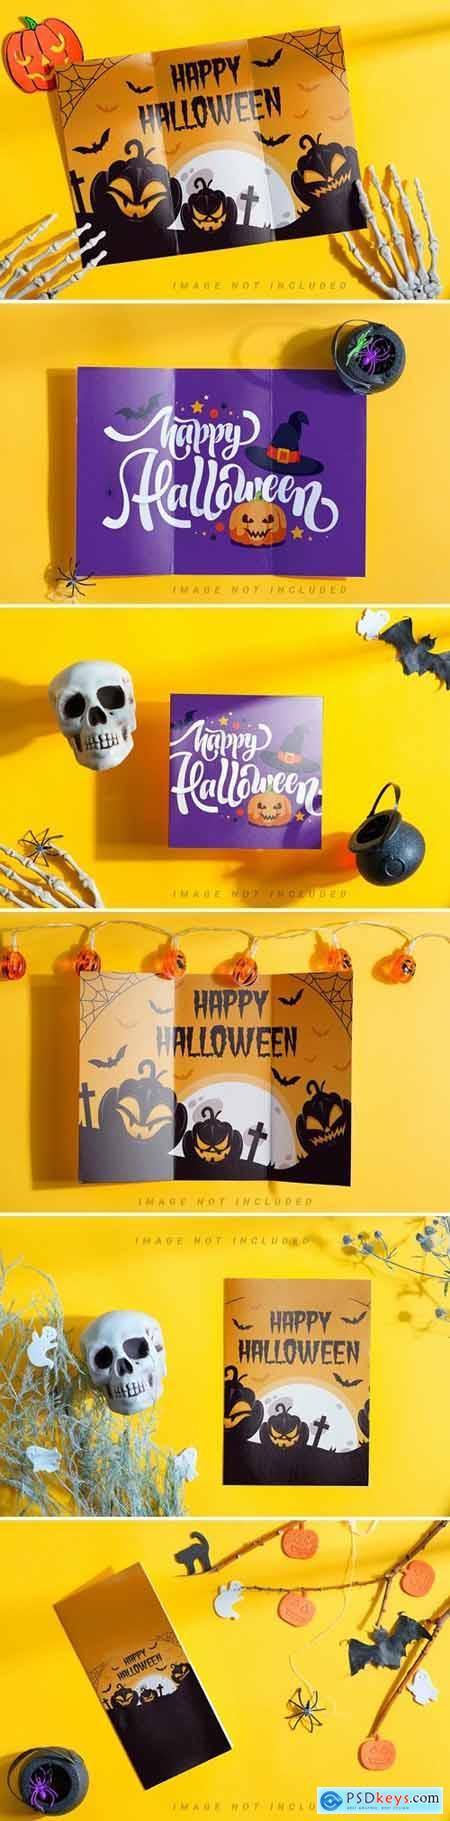 Halloween brochure mockup set